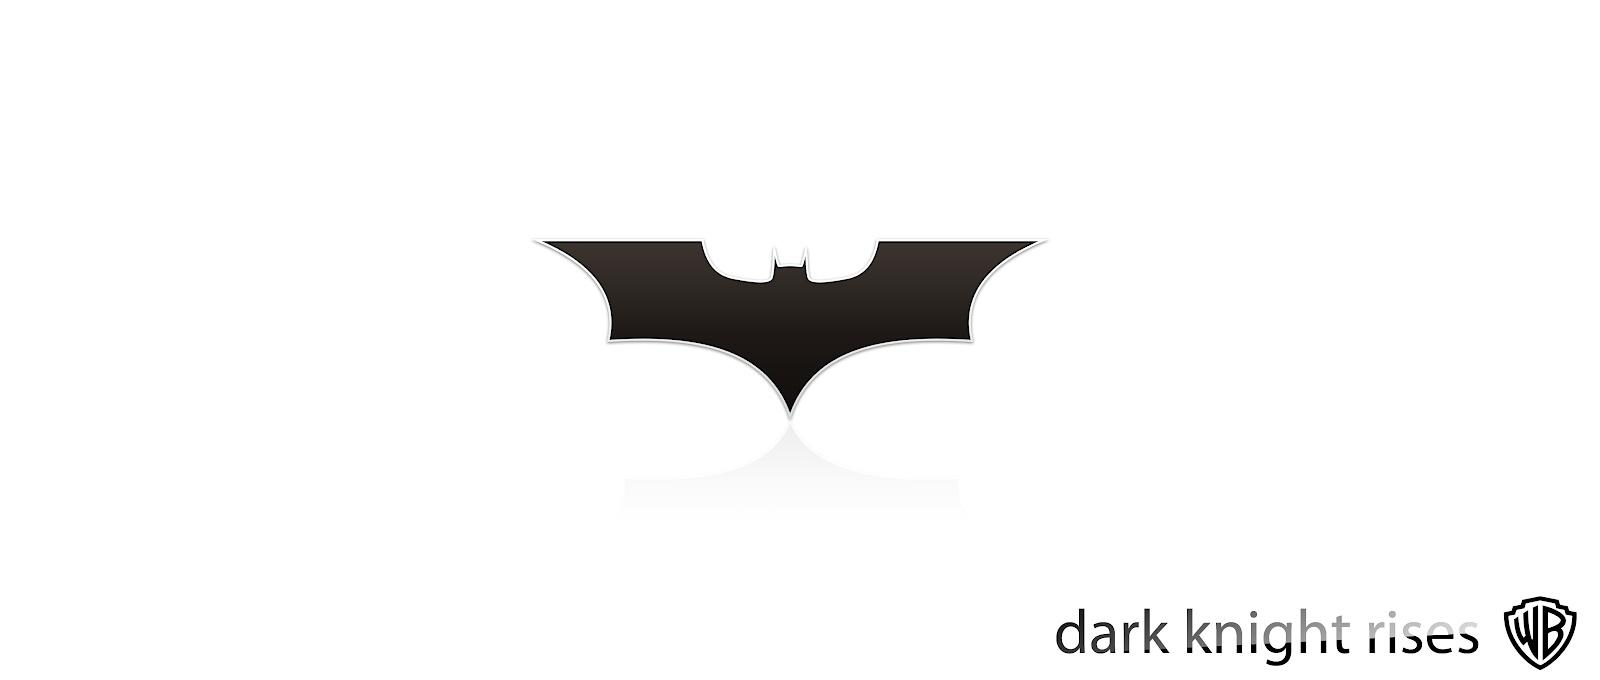 Holy, Apple Ads, Batman!